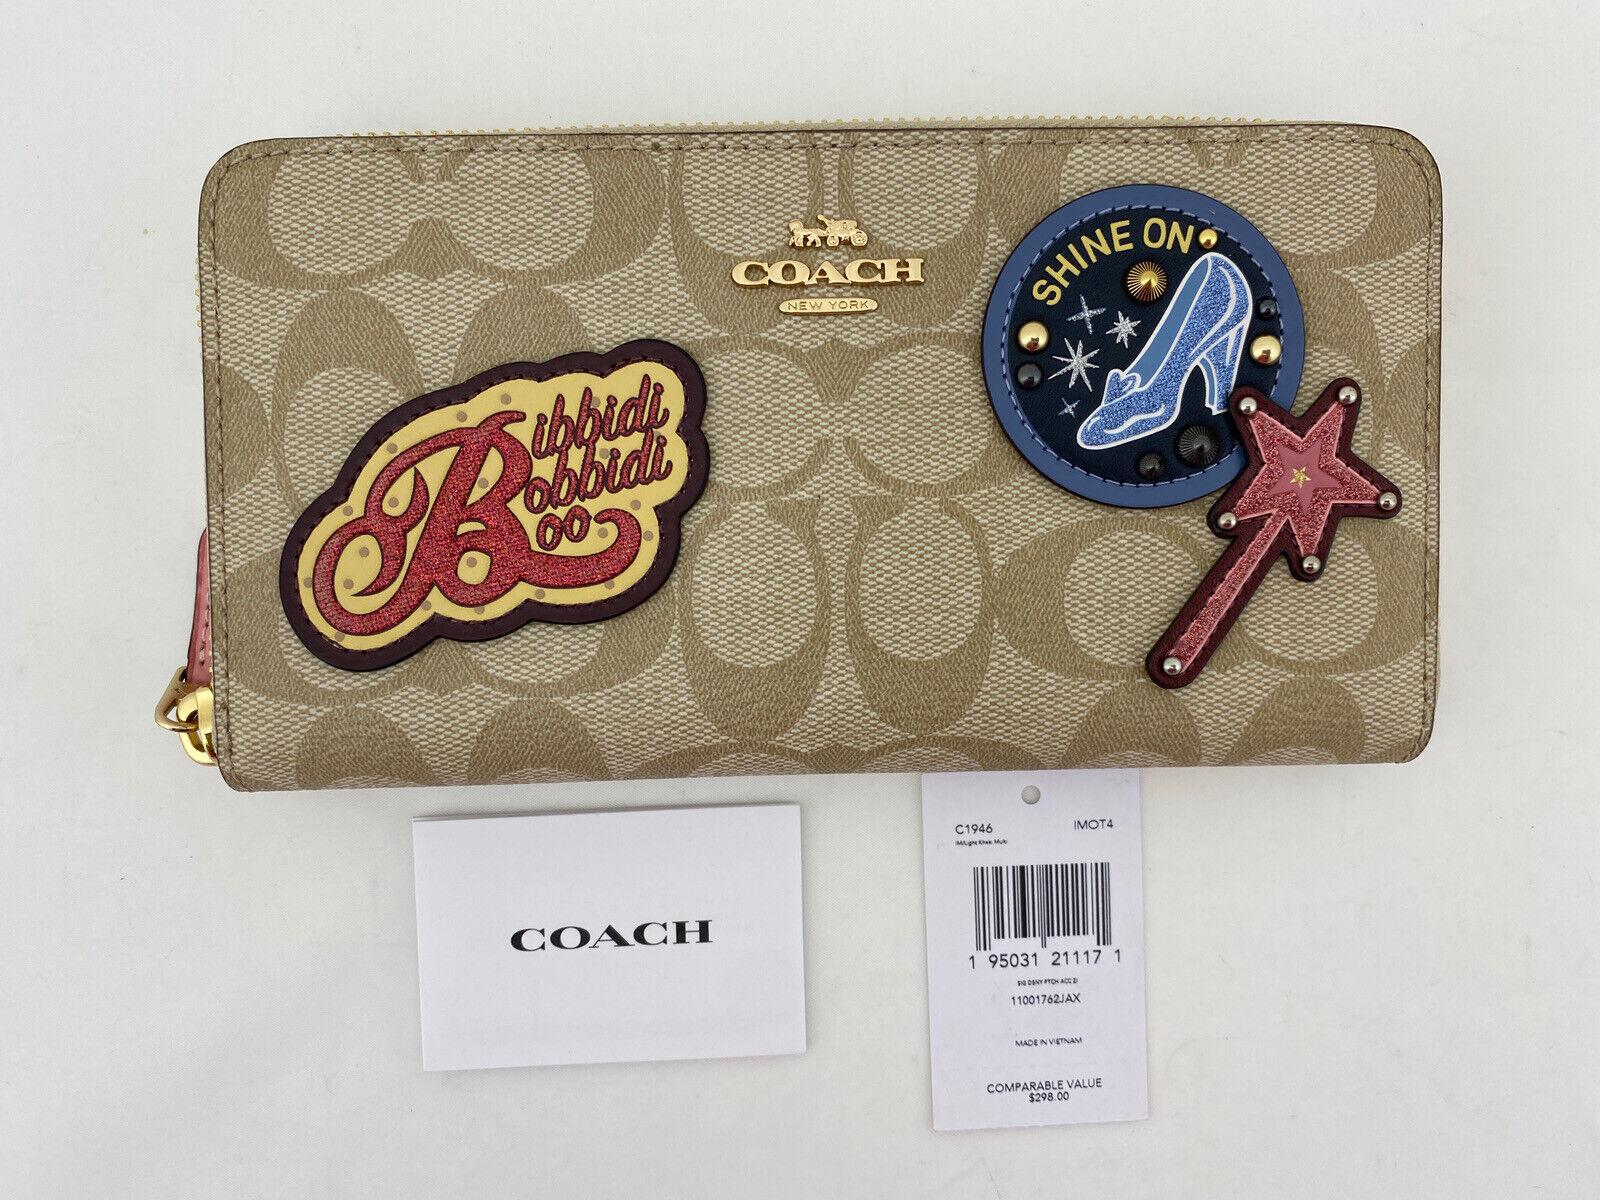 NWT Disney Coach Accordion Zip Wallet Signature Canvas w/ Patches C1946